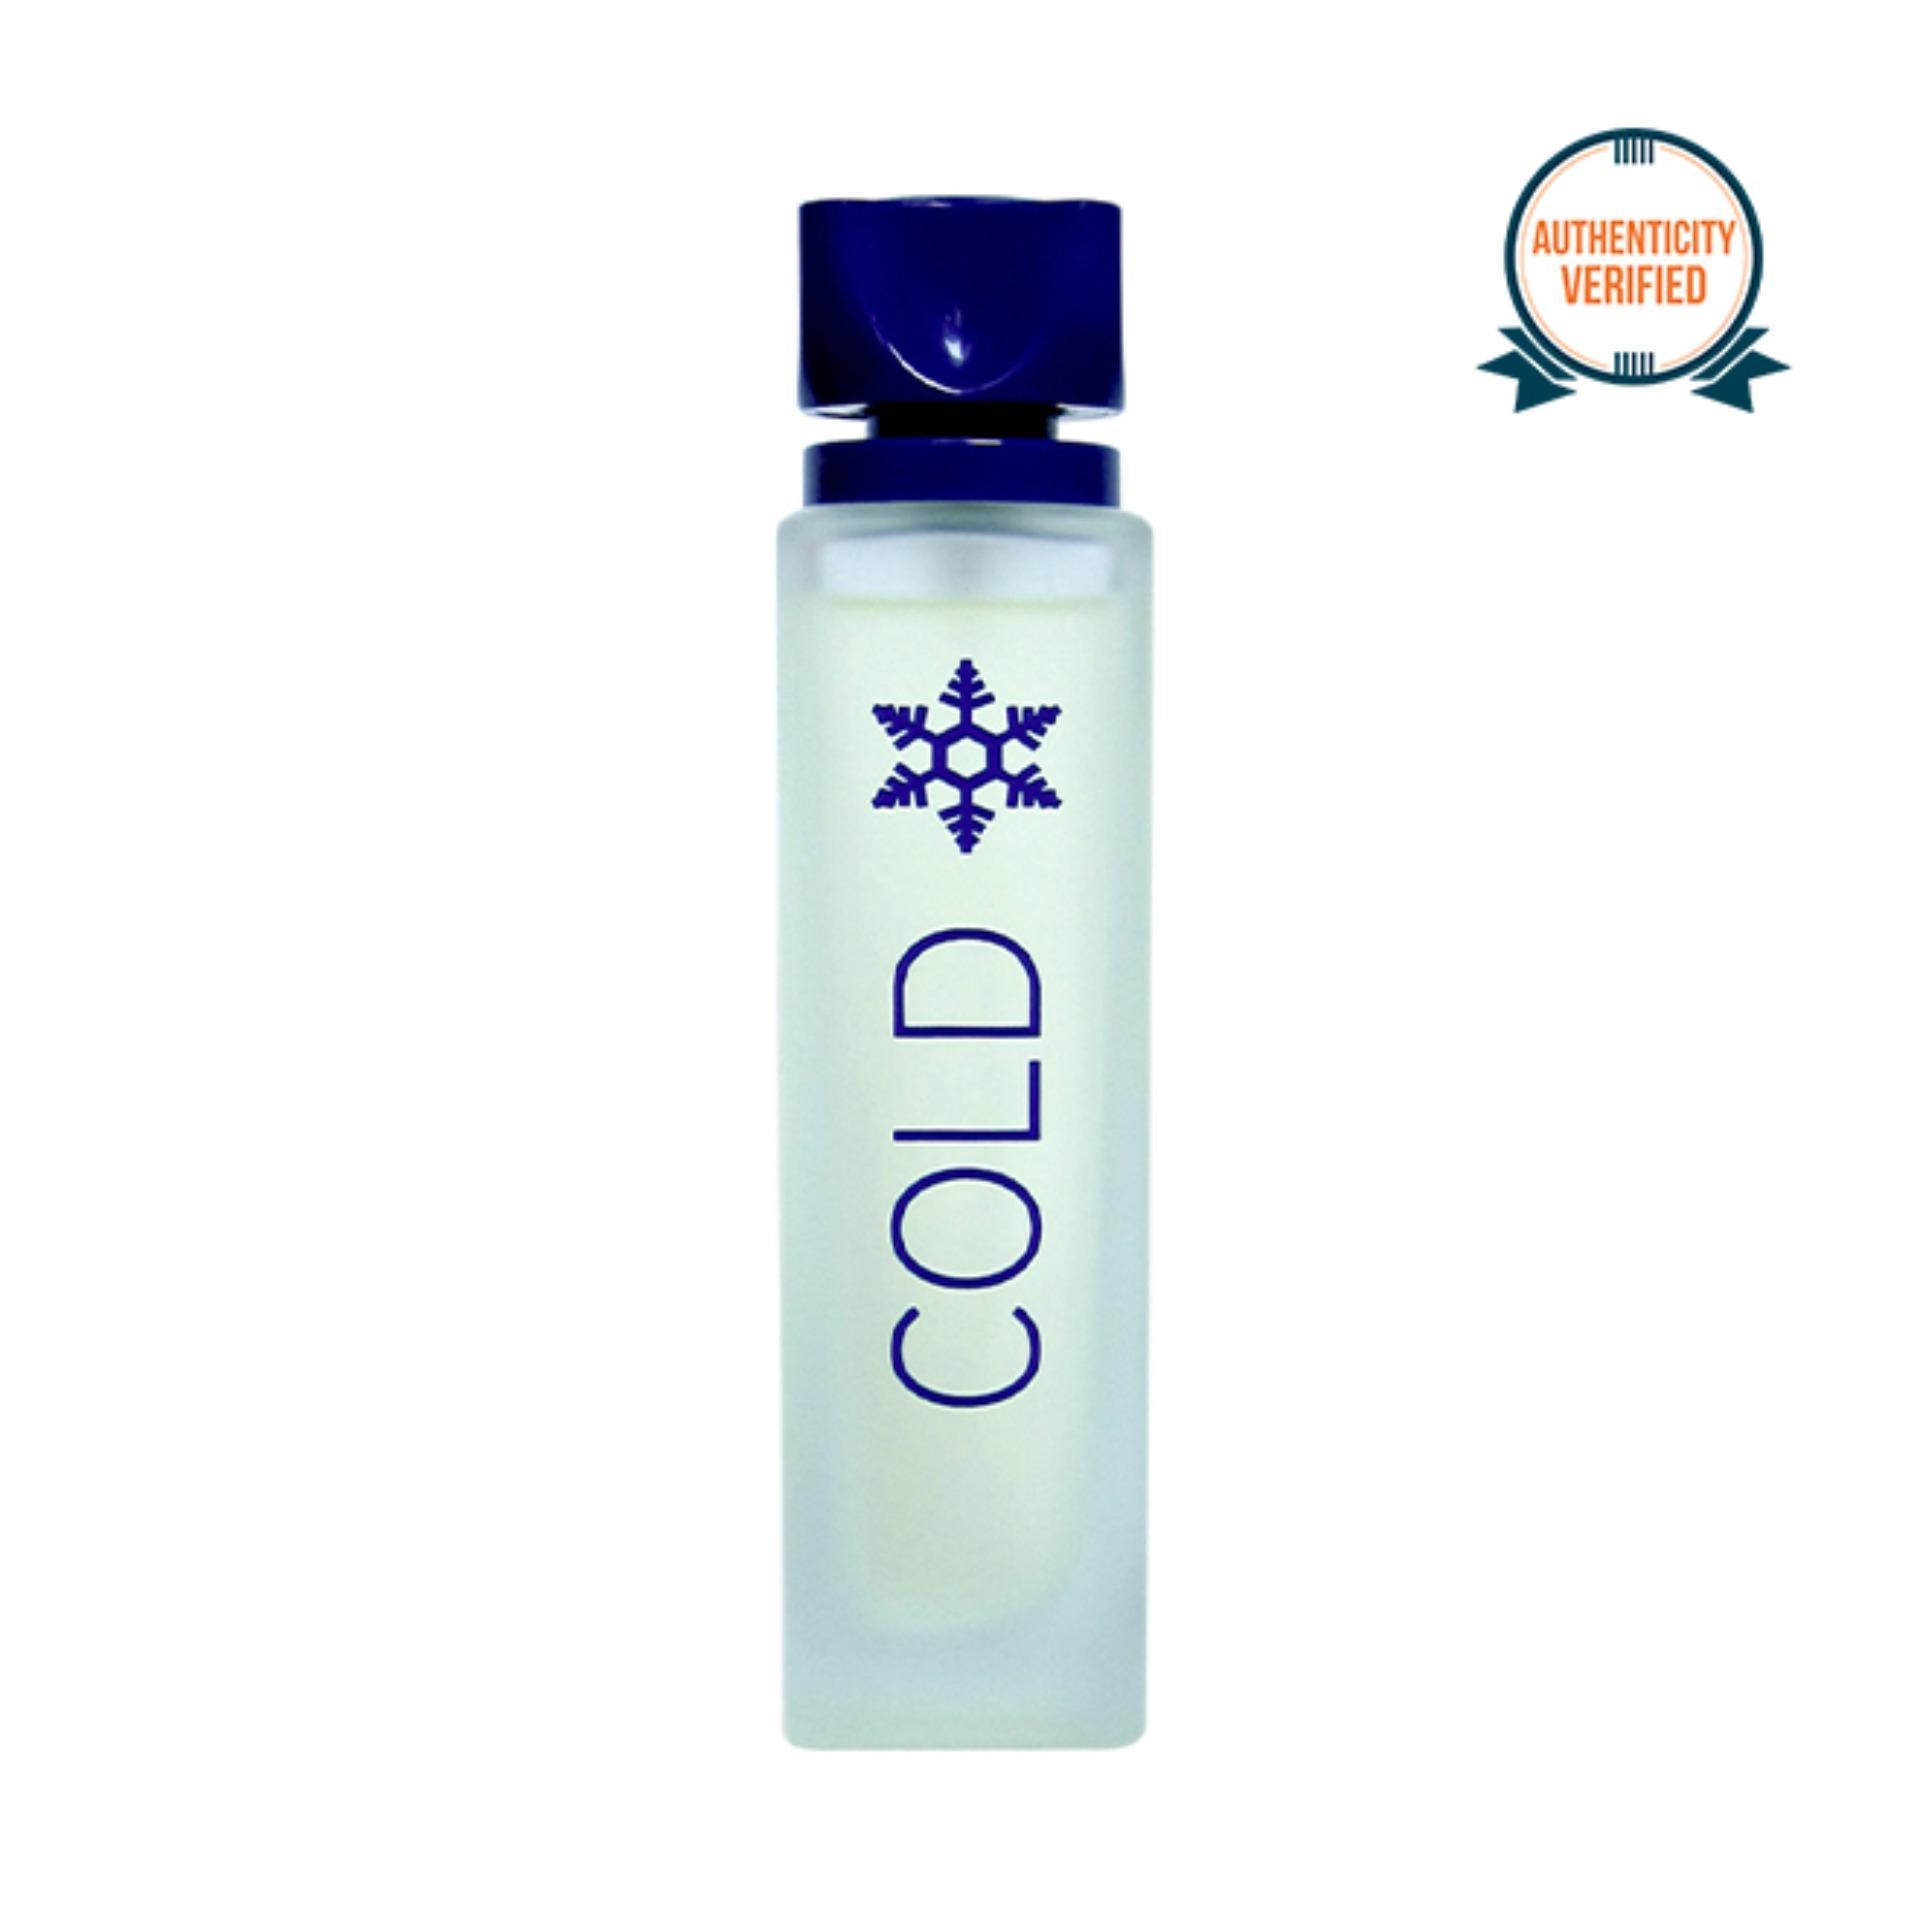 Cold Eau de Toilette for Men 100ml product preview, discount at cheapest price